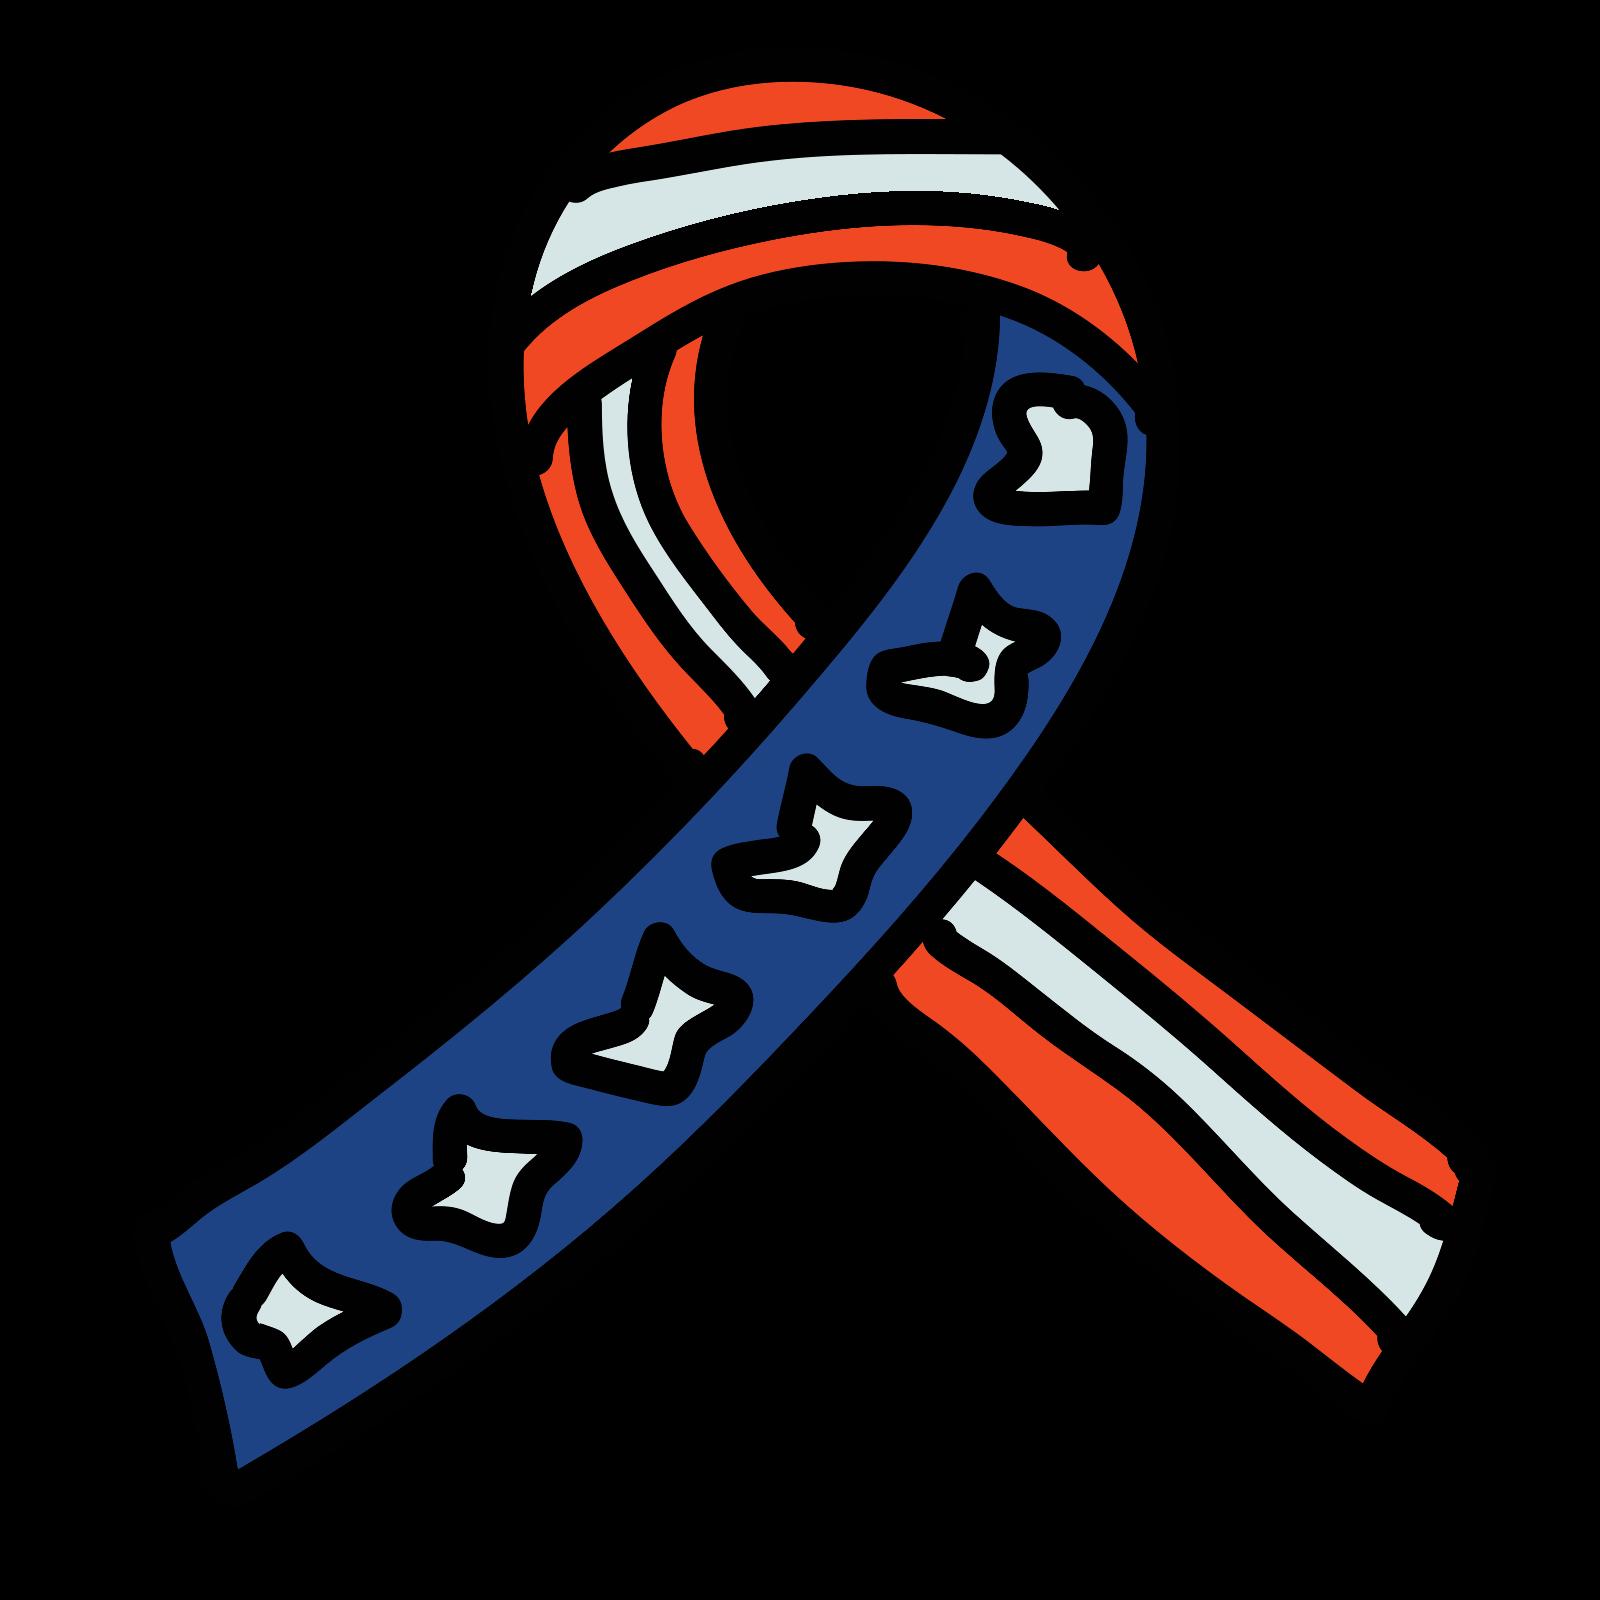 USA Ribbon icon